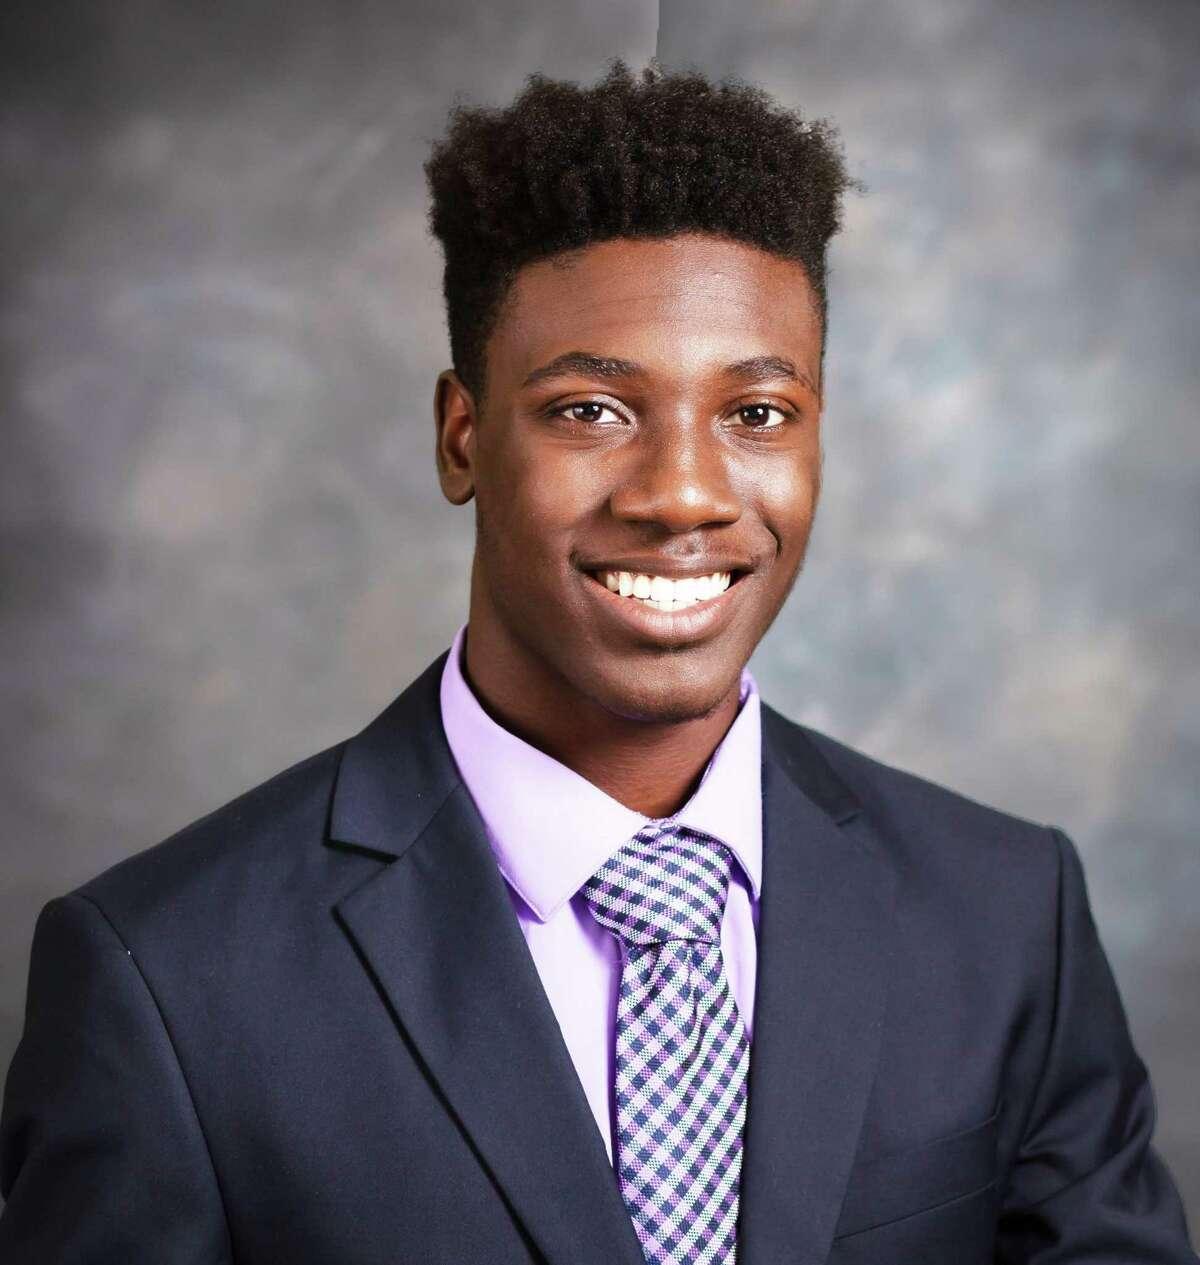 Middletown resident Osiah Wiggins of Xavier High School won the Kiwanis Club of Middletown's 2020 annual scholarship award.